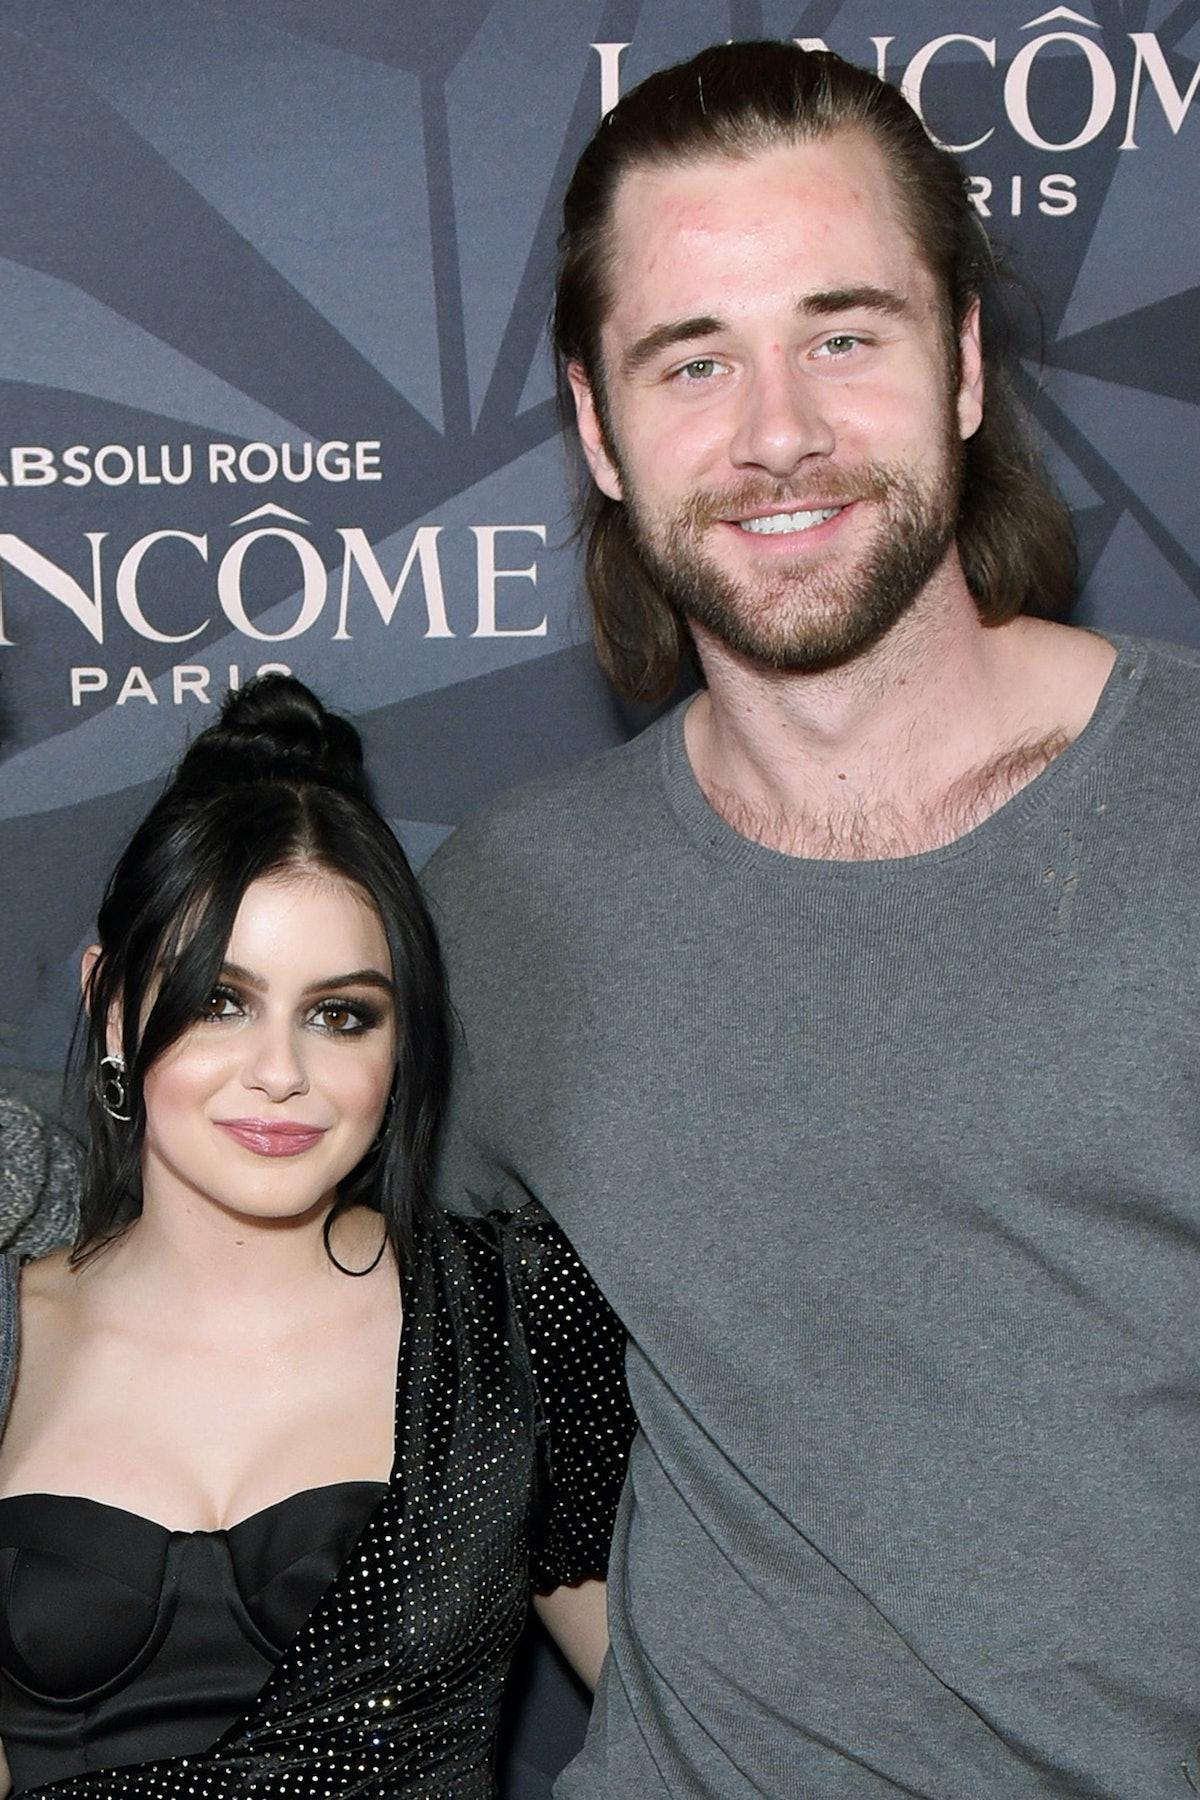 Ariel Winter and Luke Benward may be dating